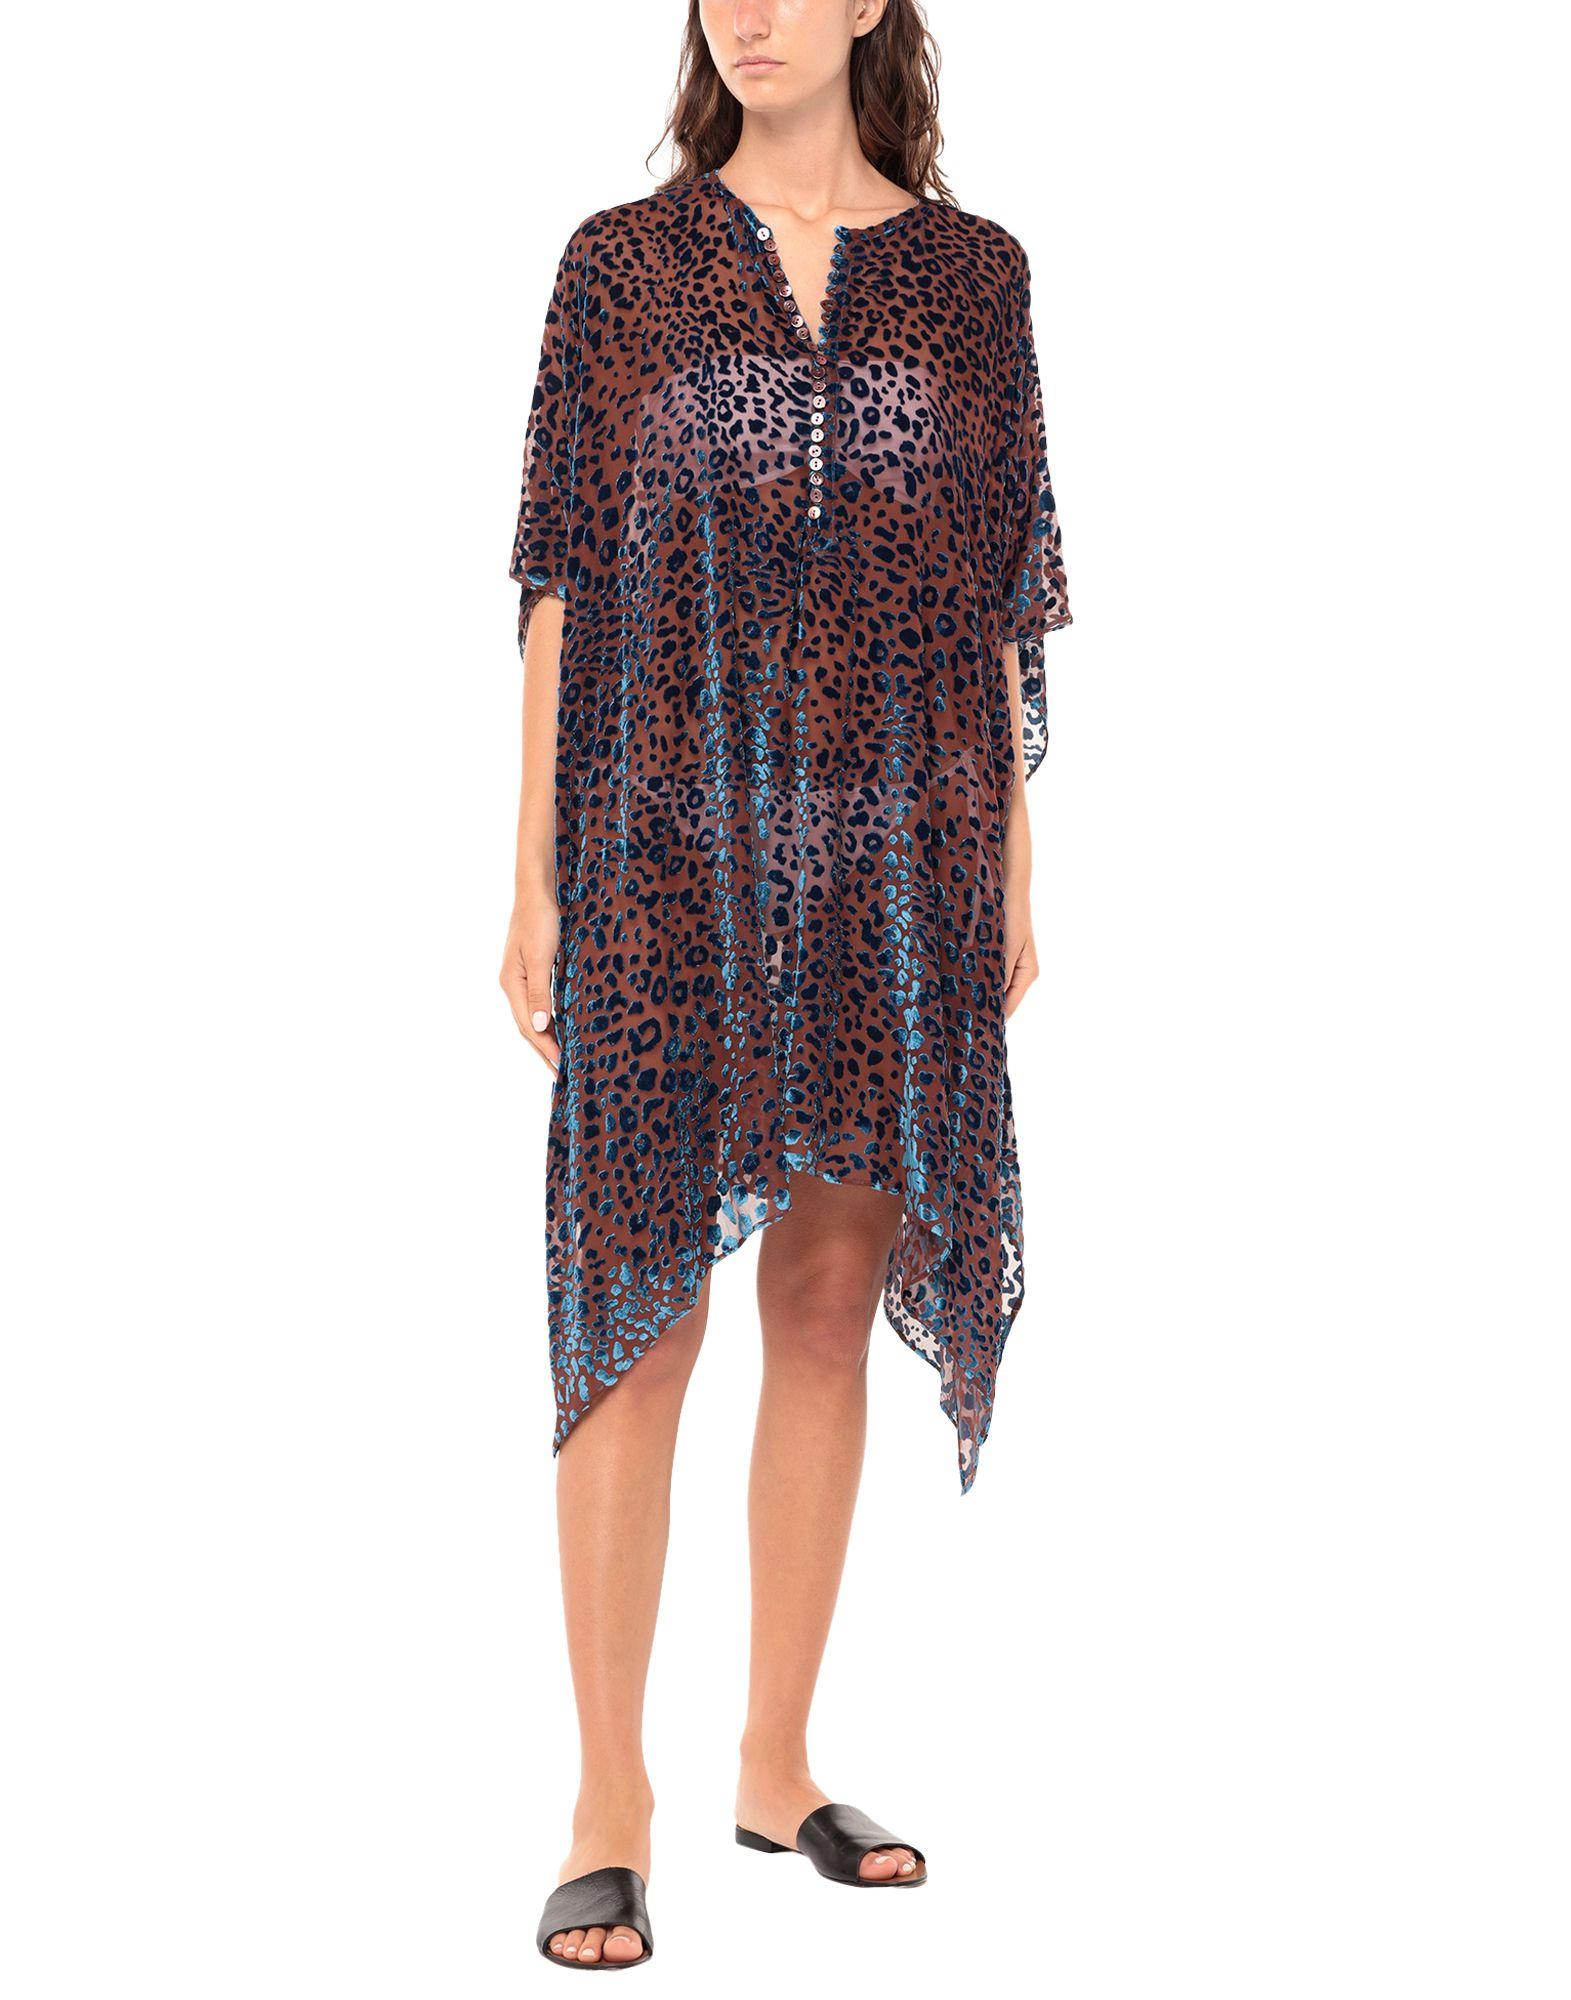 MAISON MARGIELA Cover-ups. velvet, crepe, no appliqués, leopard-print, short sleeves, front closure, no pockets, button closing, unlined. 65% Viscose, 35% Silk